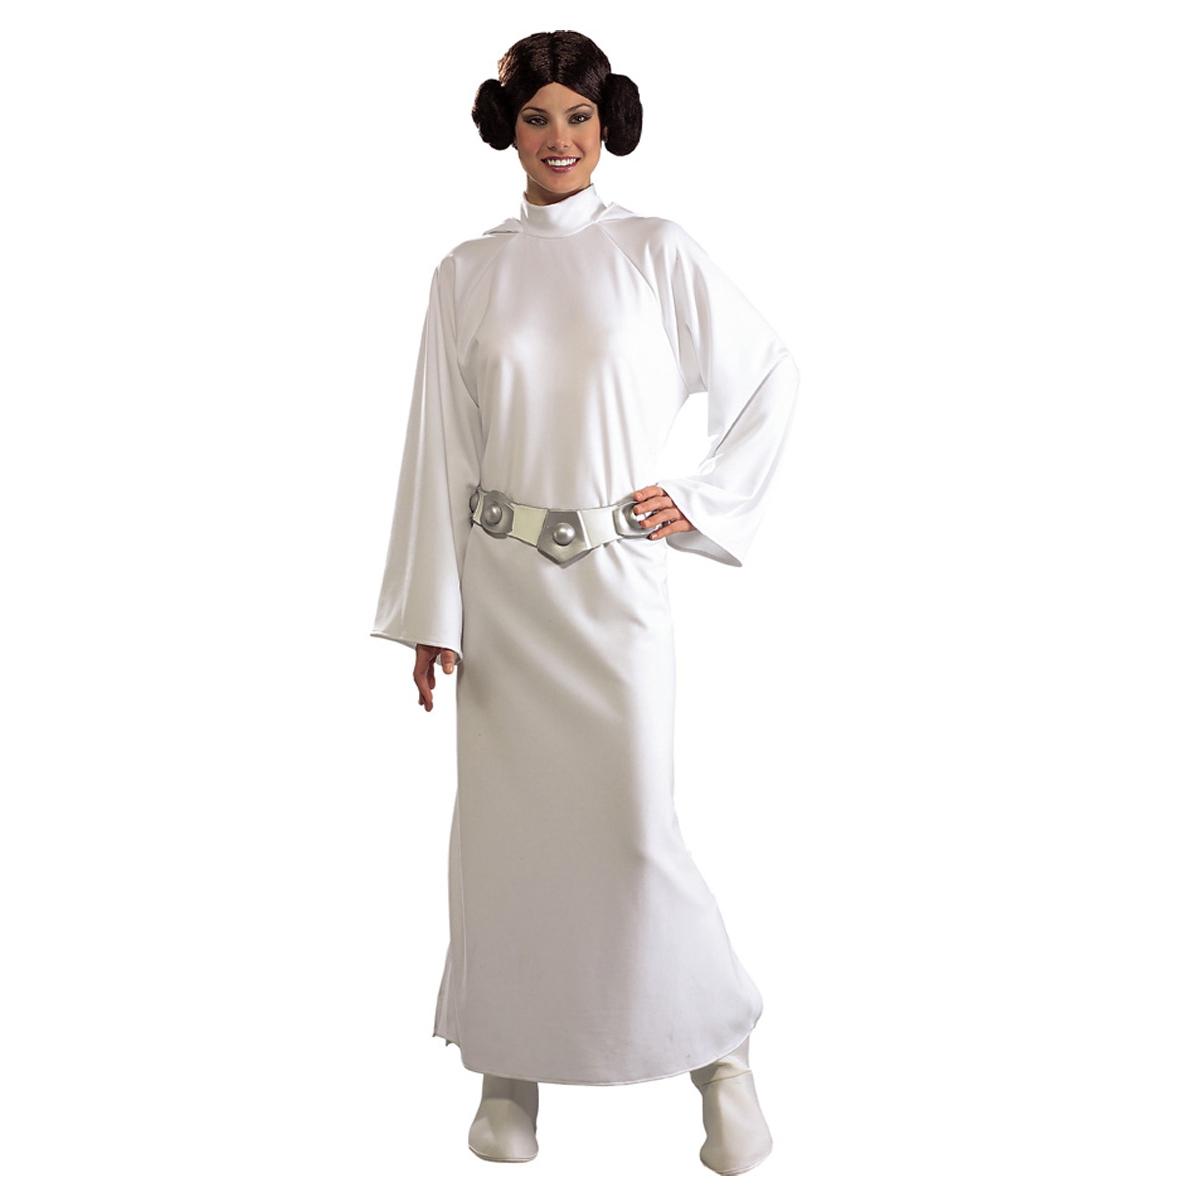 Dräkt, prinsessan Leia deluxe